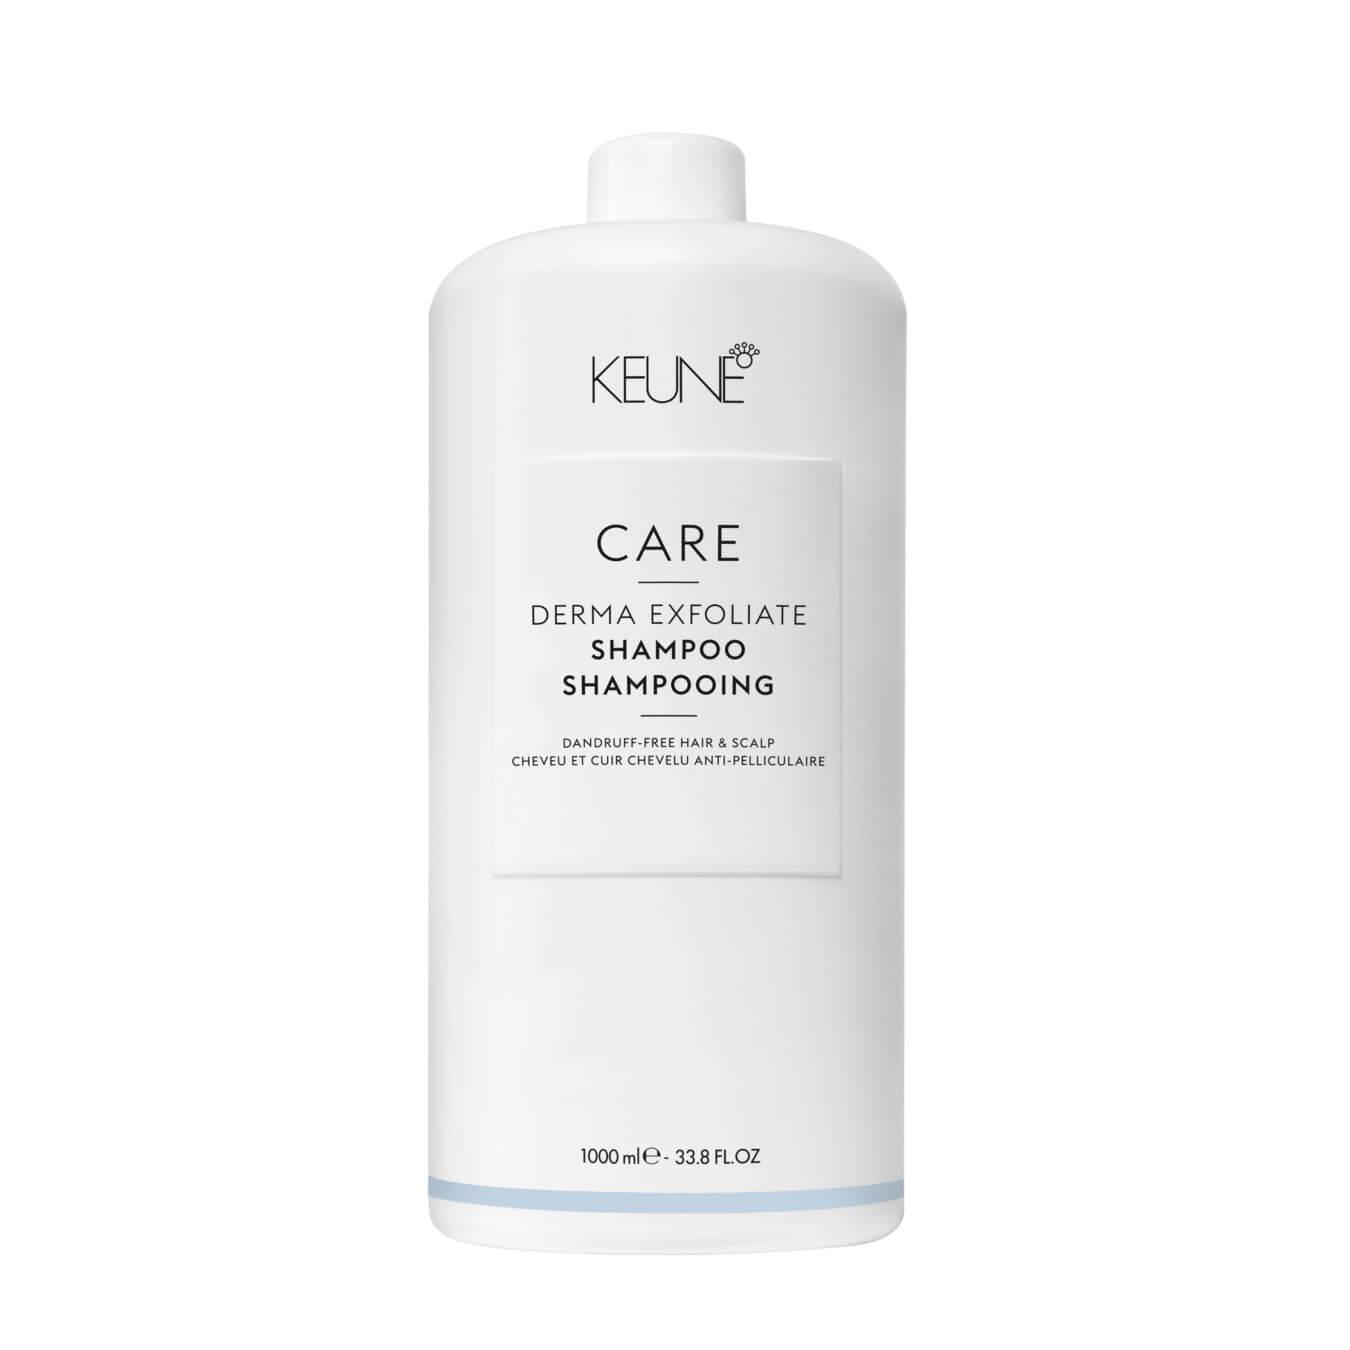 Kauf Keune Care Derma Exfoliate Shampoo 1000ml